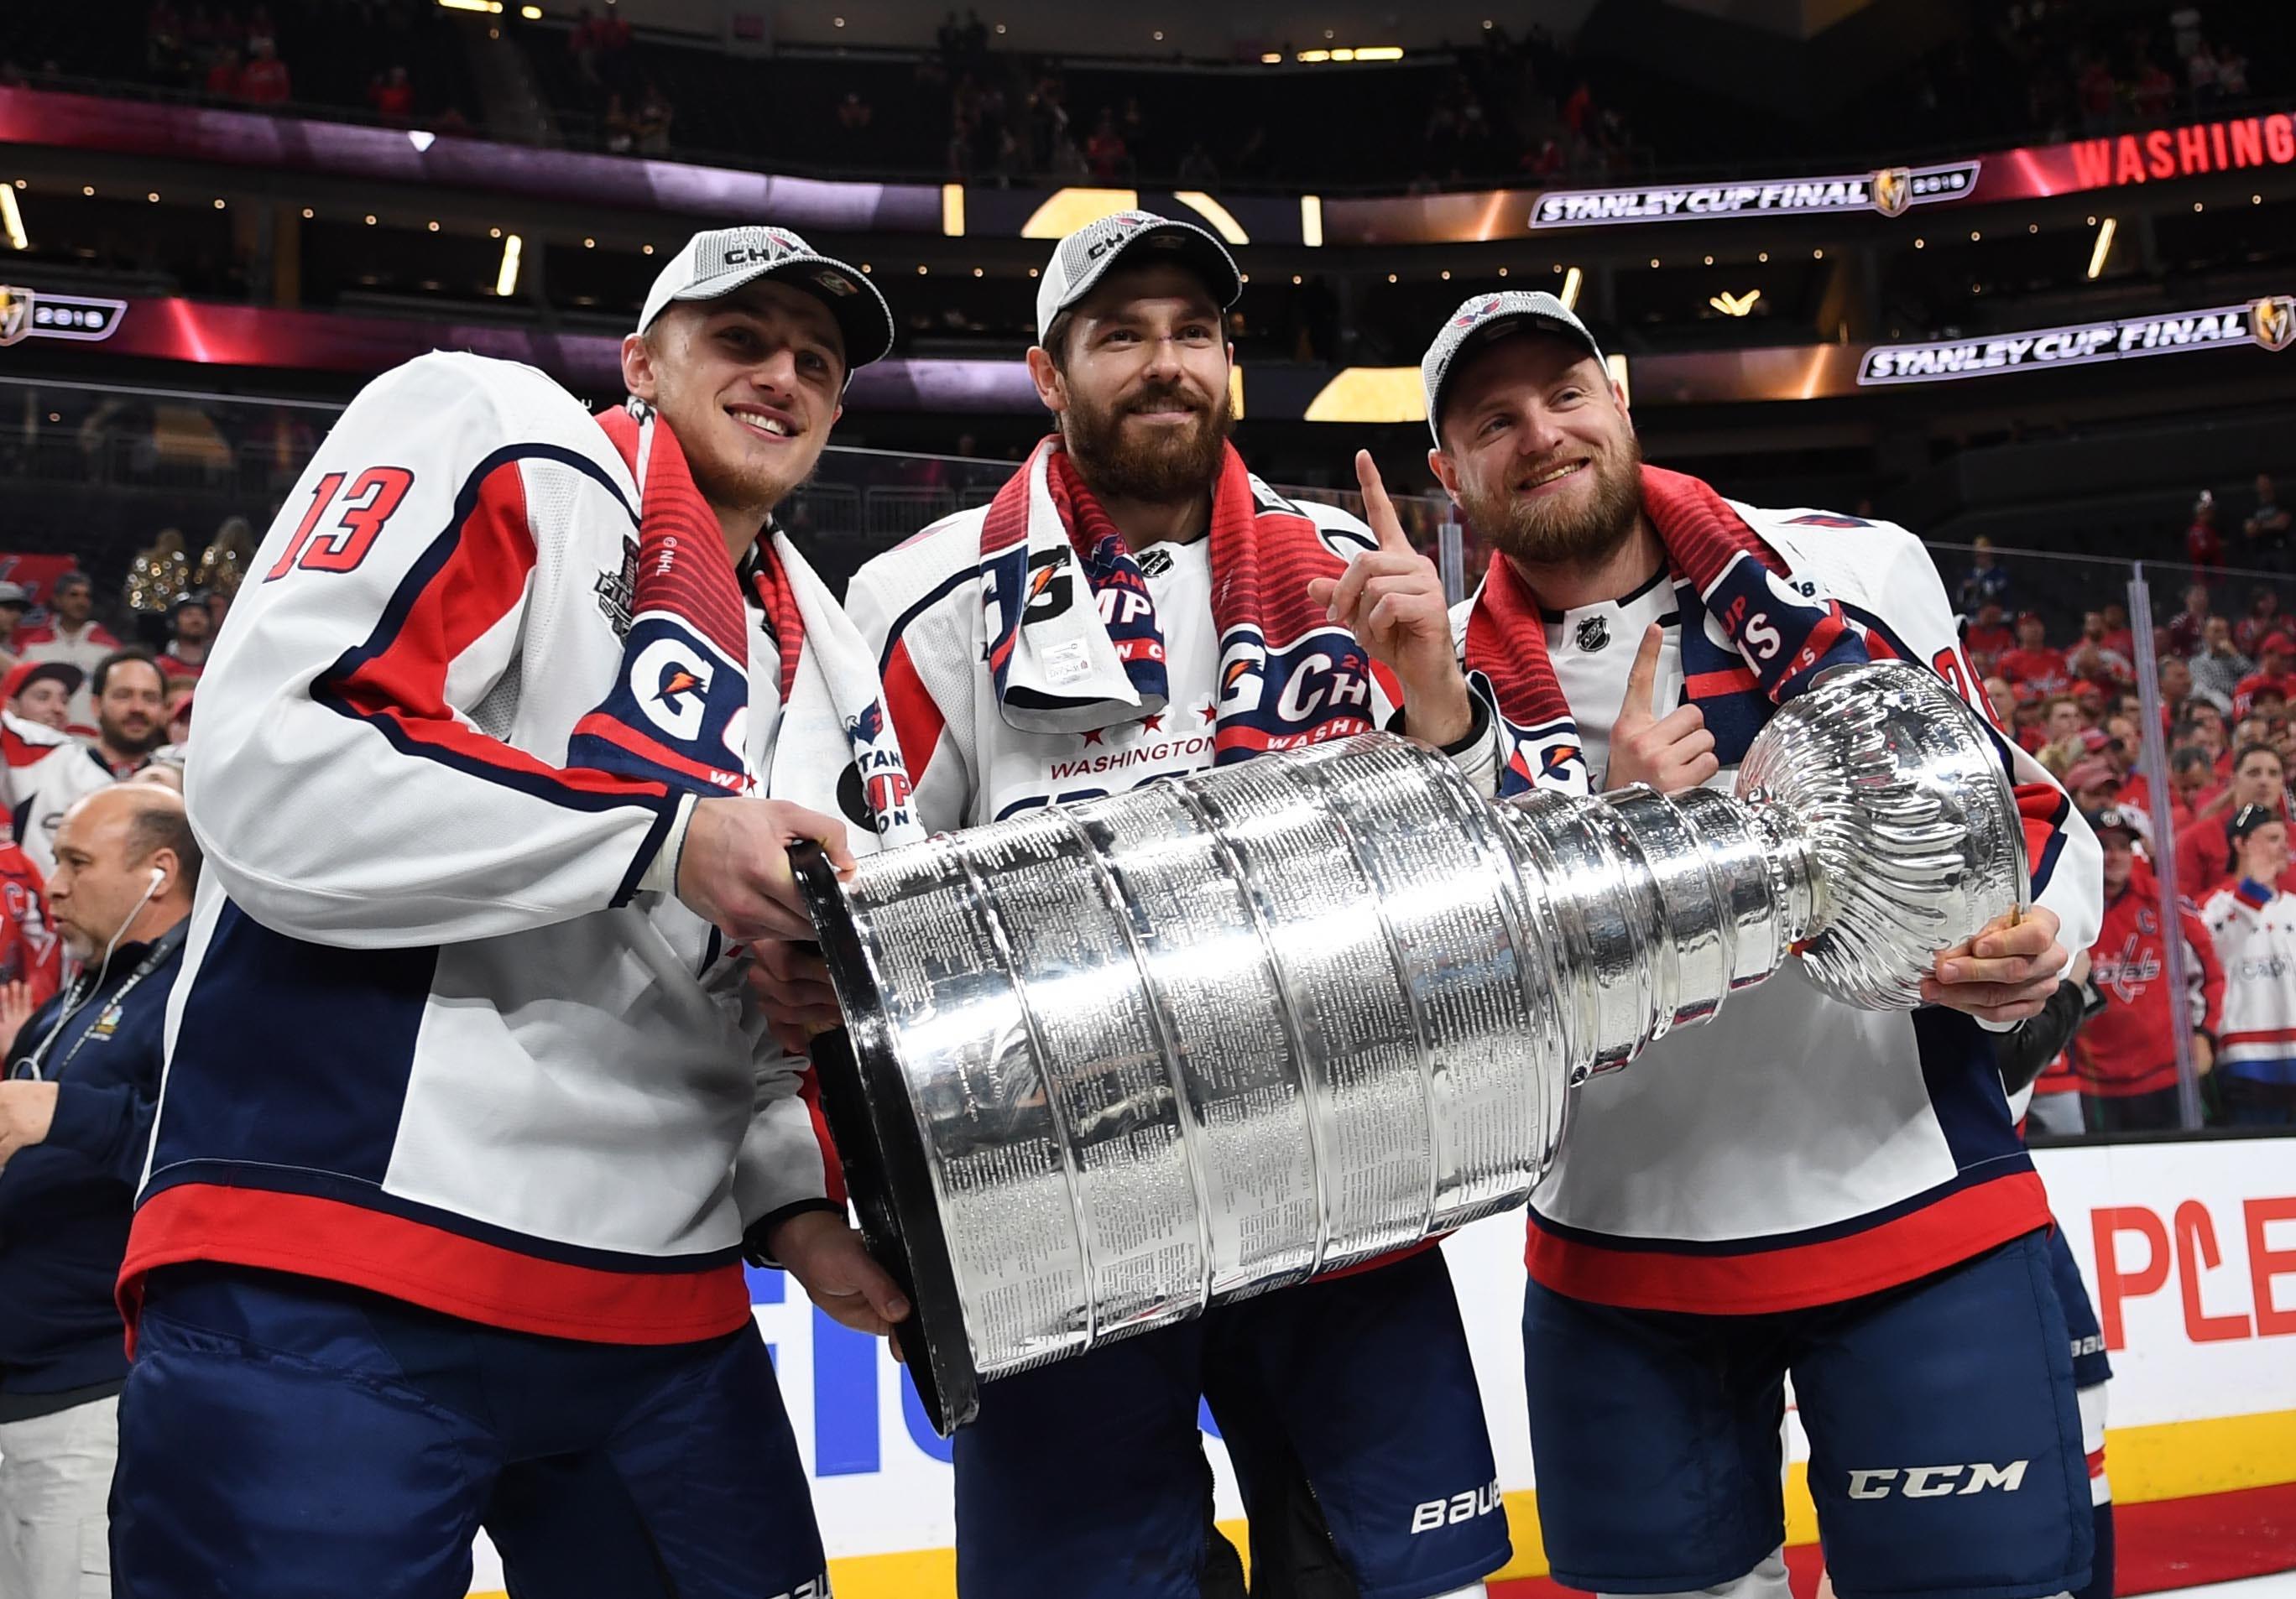 713006a45 636640890367310638-USP-NHL-Stanley-Cup-Final-Washington-Capitals-at-100452593.JPG